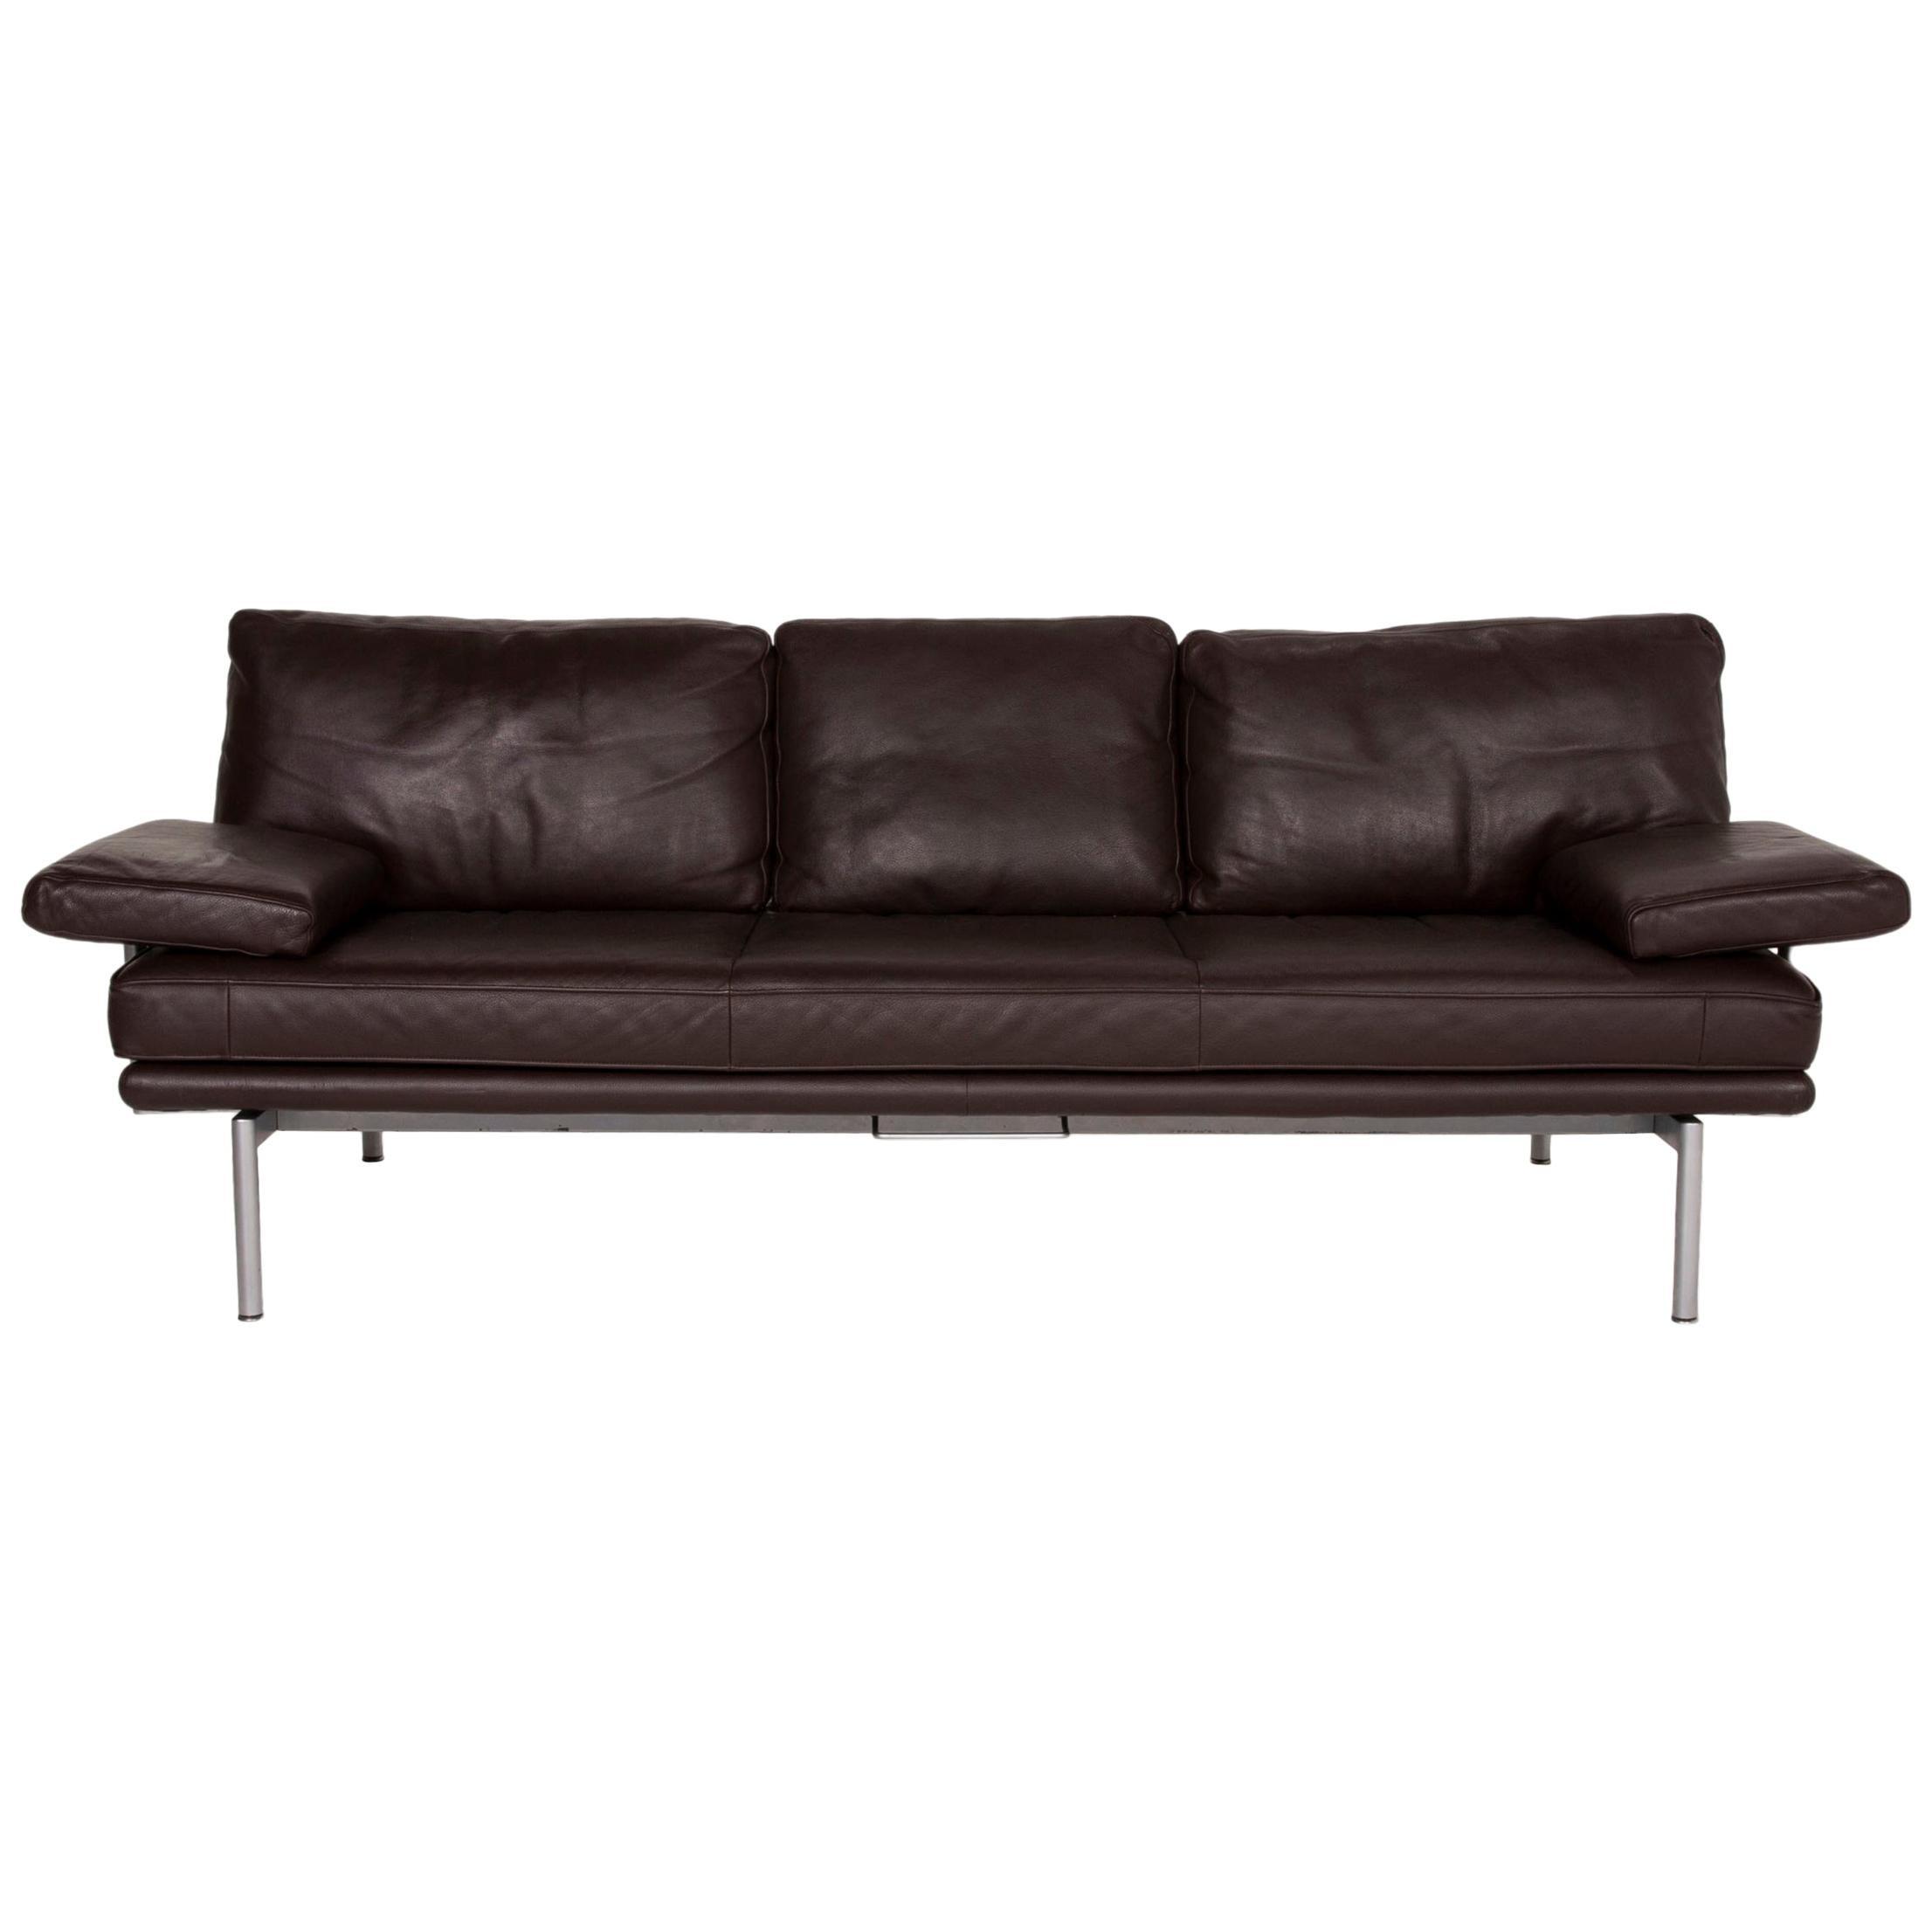 Walter Knoll Living Platform Leather Sofa Brown Three-Seater Function Dark Brown